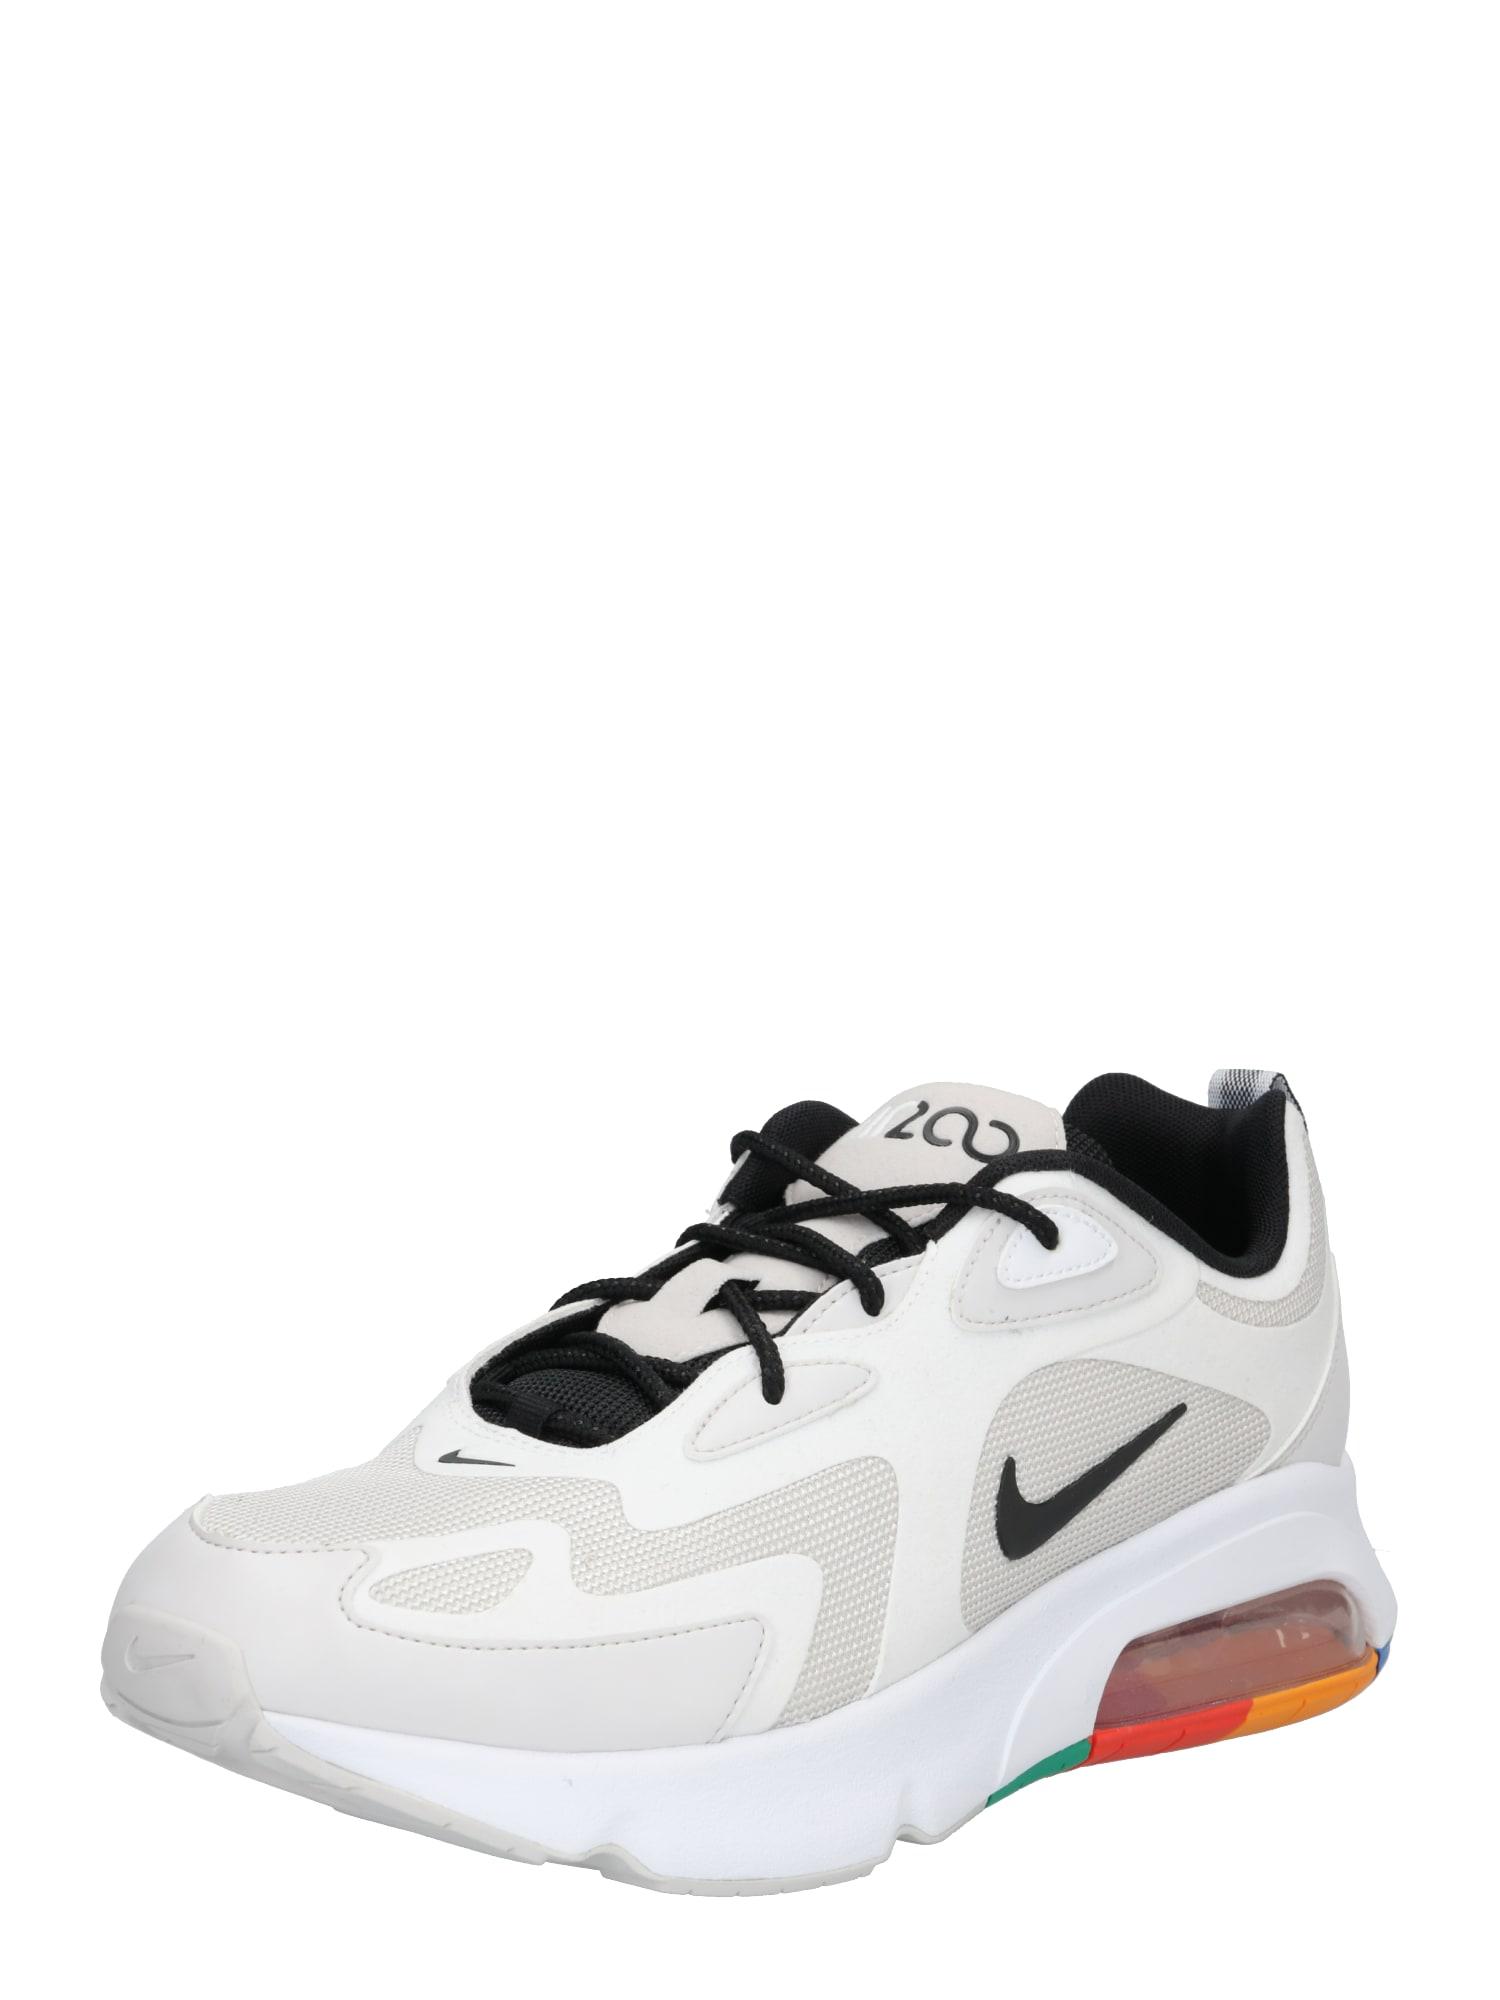 Tenisky AIR MAX 200 modrá bílá Nike Sportswear